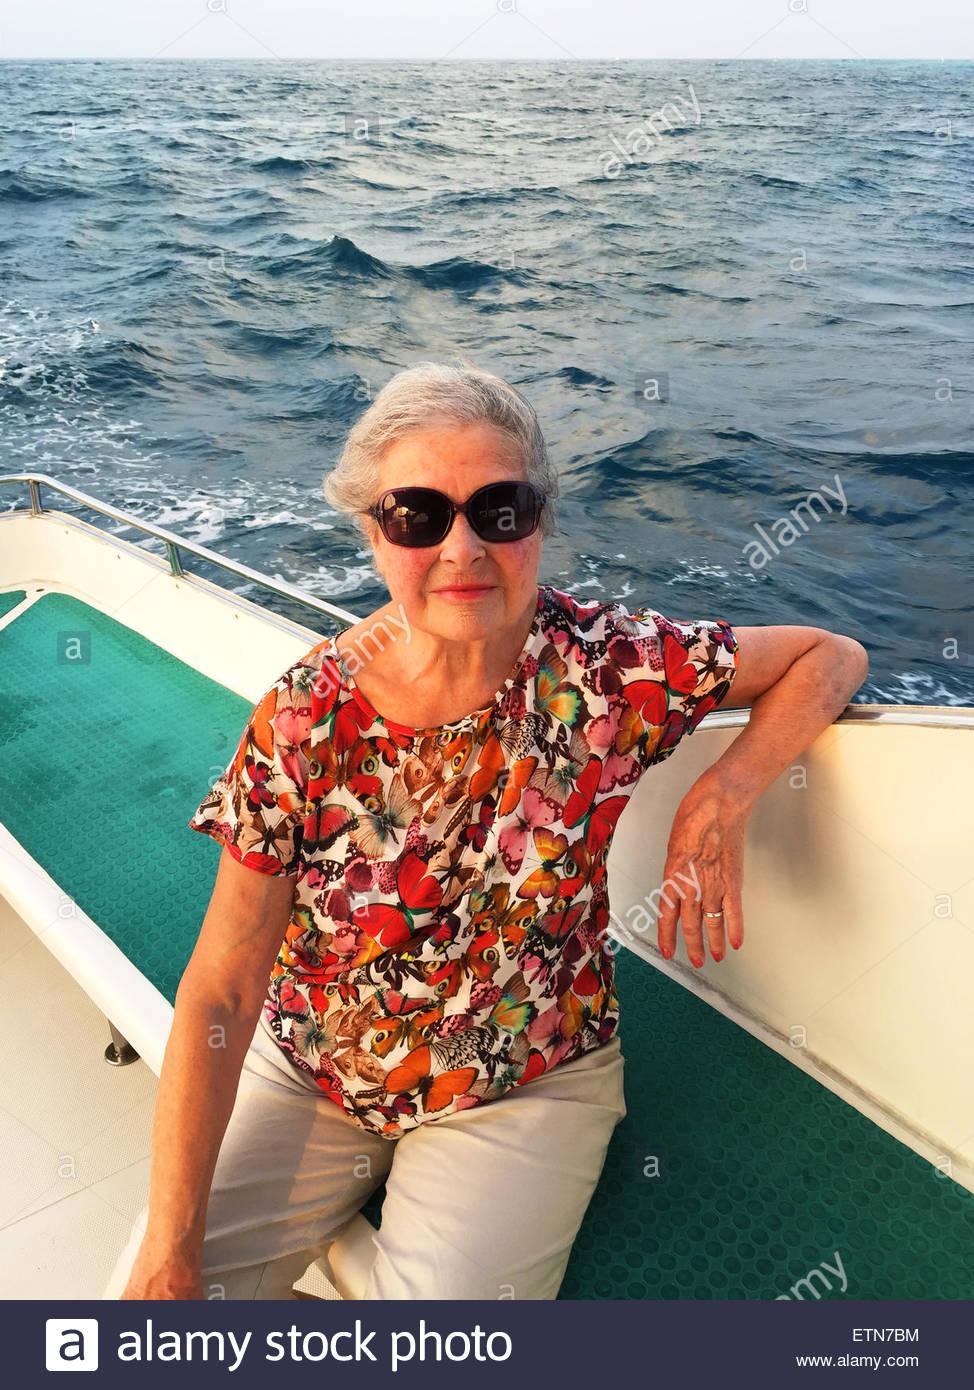 Portrait of a senior woman sitting on boat, Maldives - Stock Image